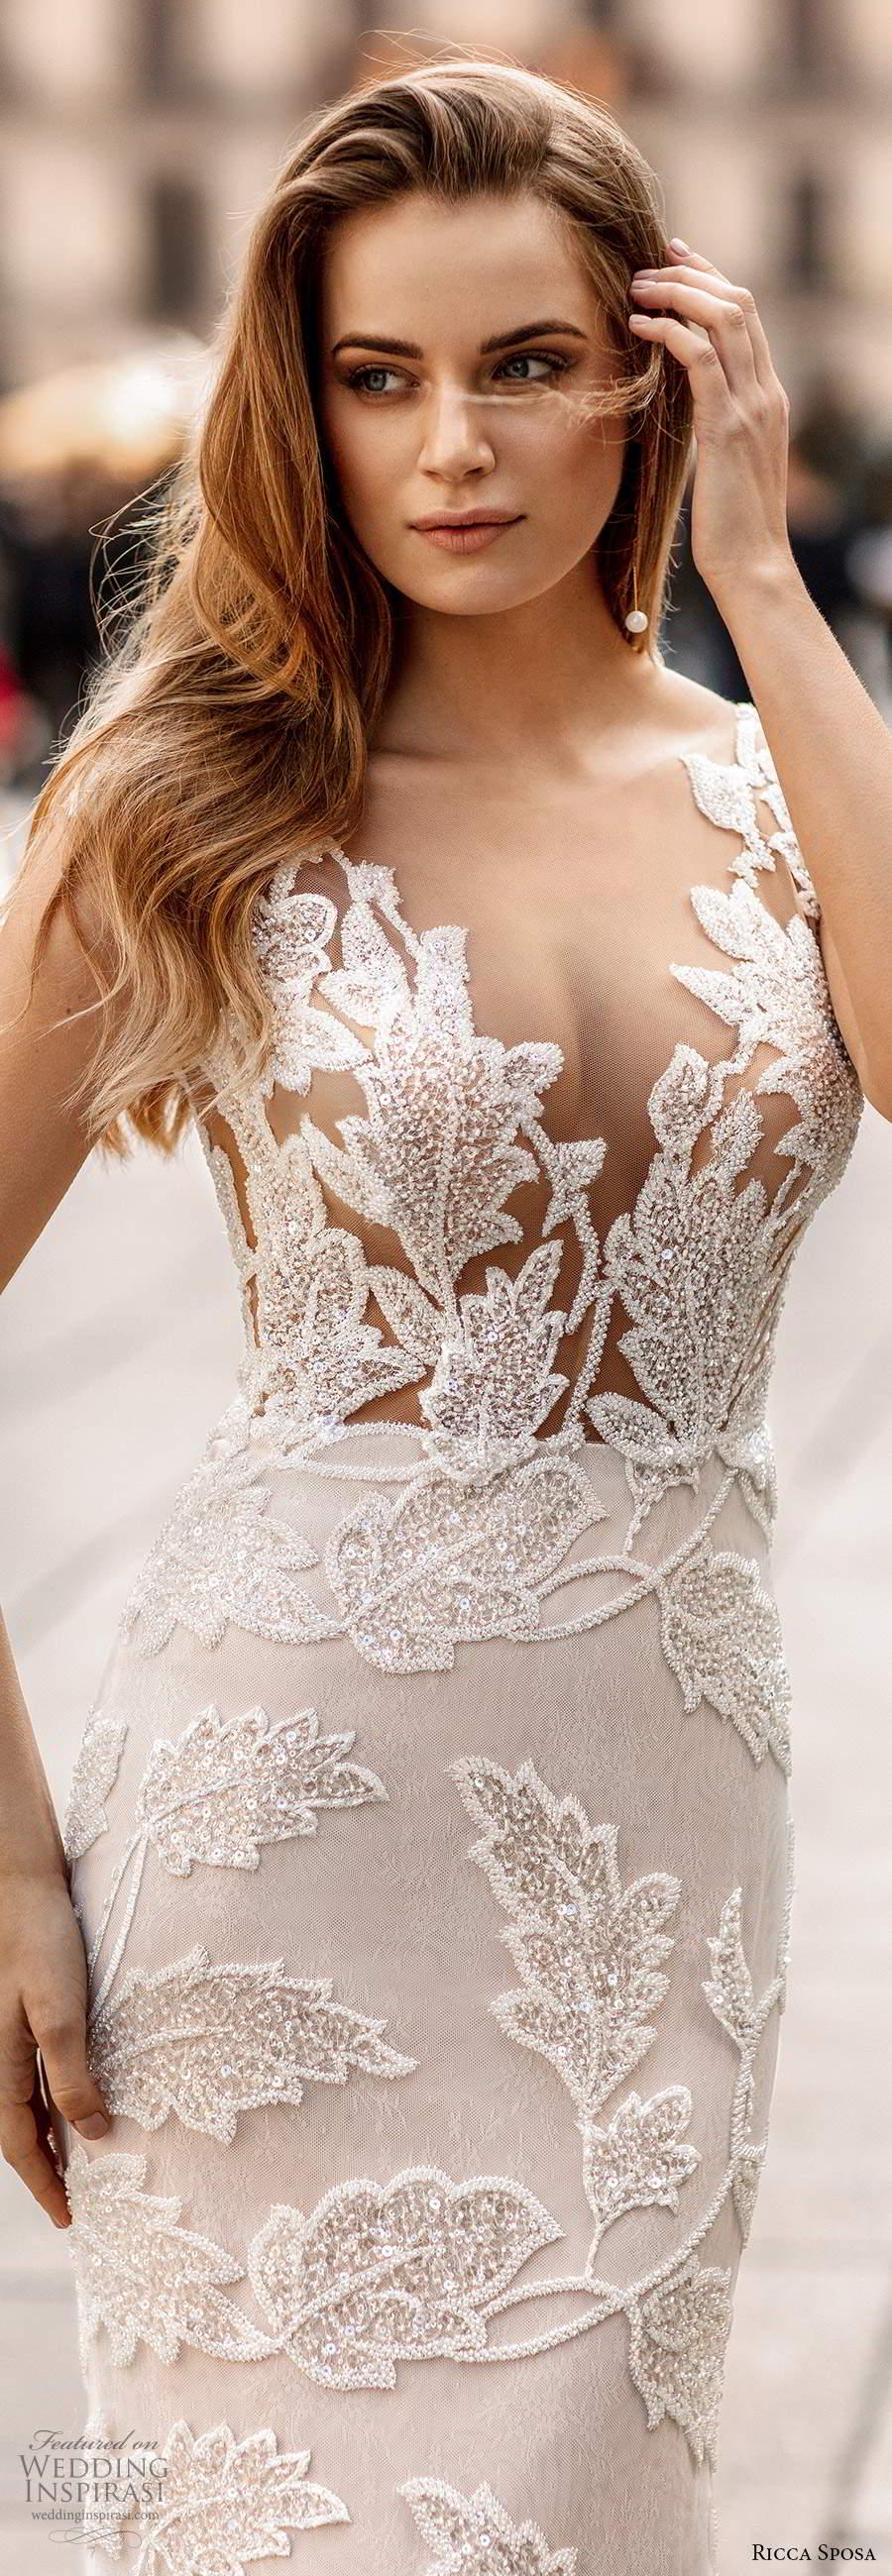 ricca sposa 2020 barcelona bridal illusion cap sleeves plunging v neckline sheer bodice fully embellished glitzy mermaid sheath wedding dress pink sheer back chapel train (10) zv